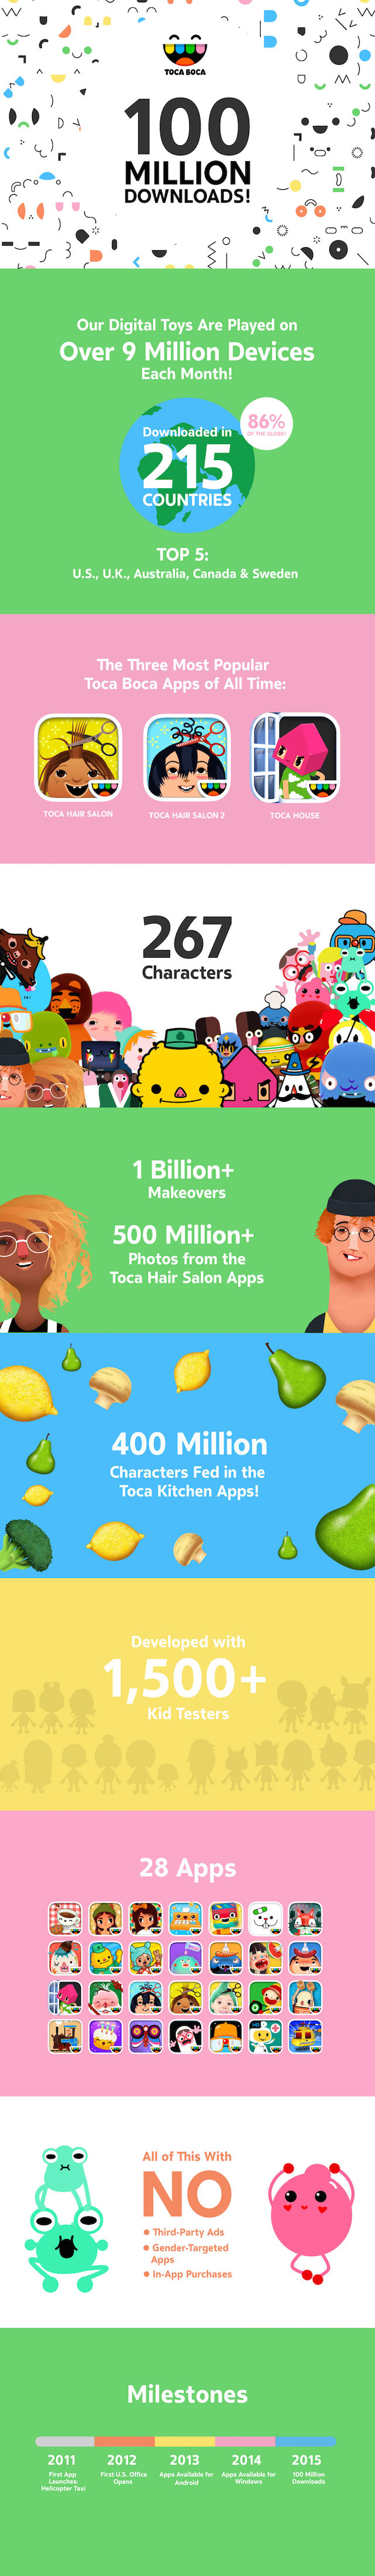 Toca-Boca-100-Million